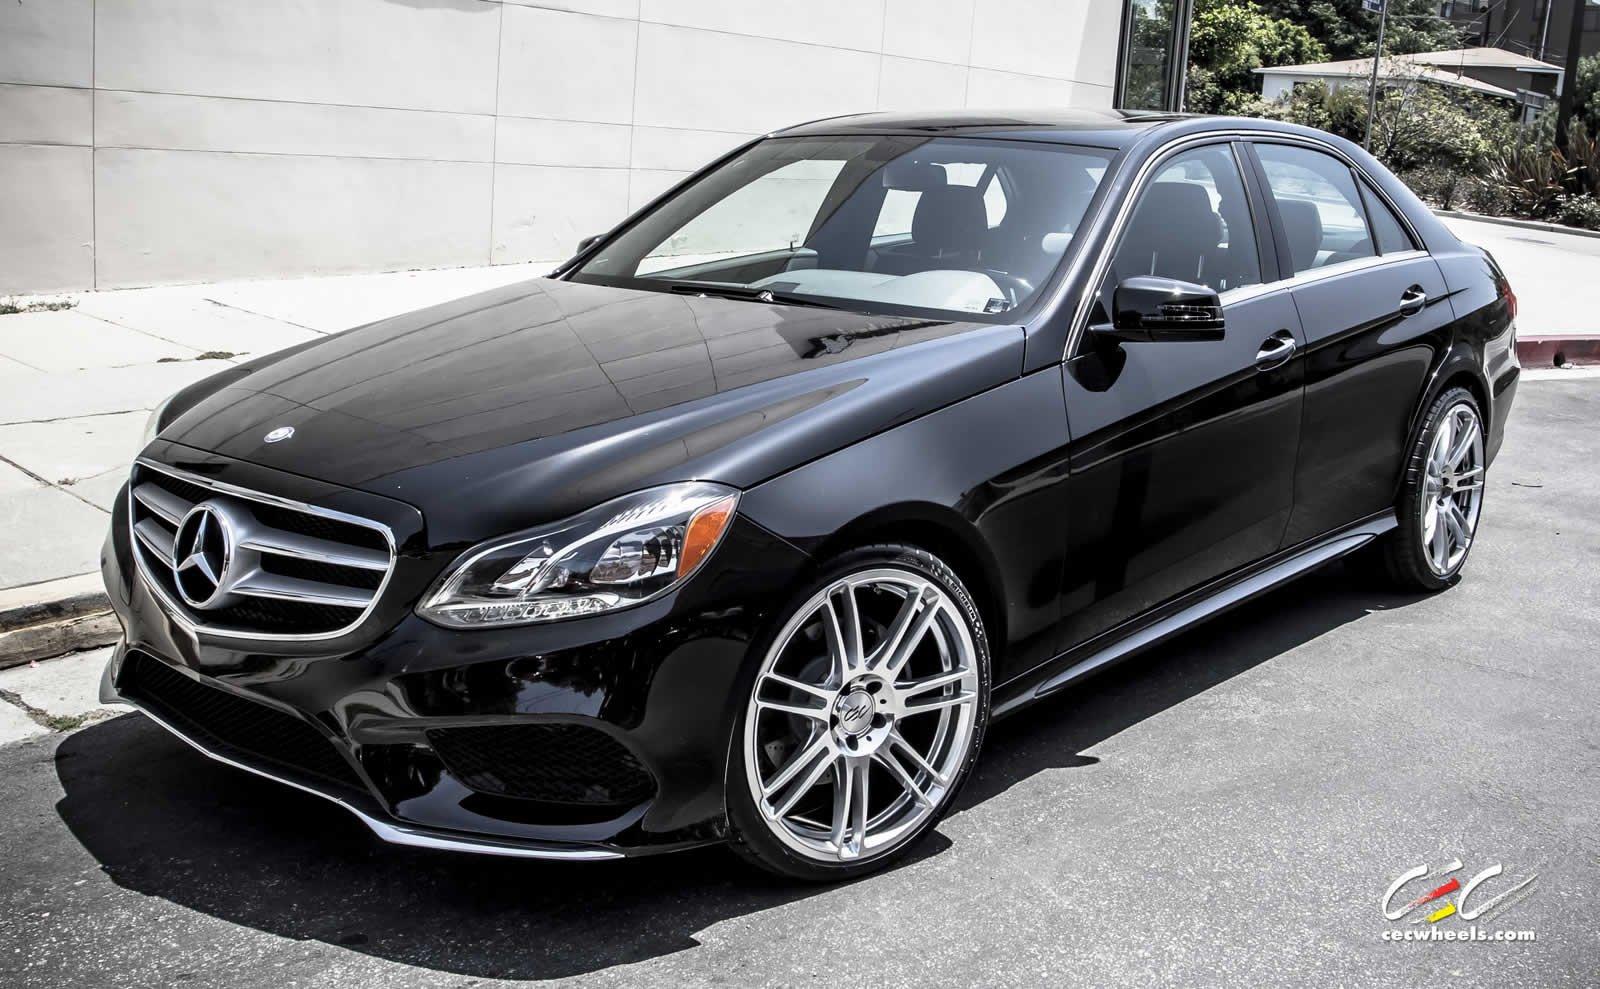 2015 cec wheels tuning cars mercedes benz carlsson e350 for Mercedes benz accessories e350